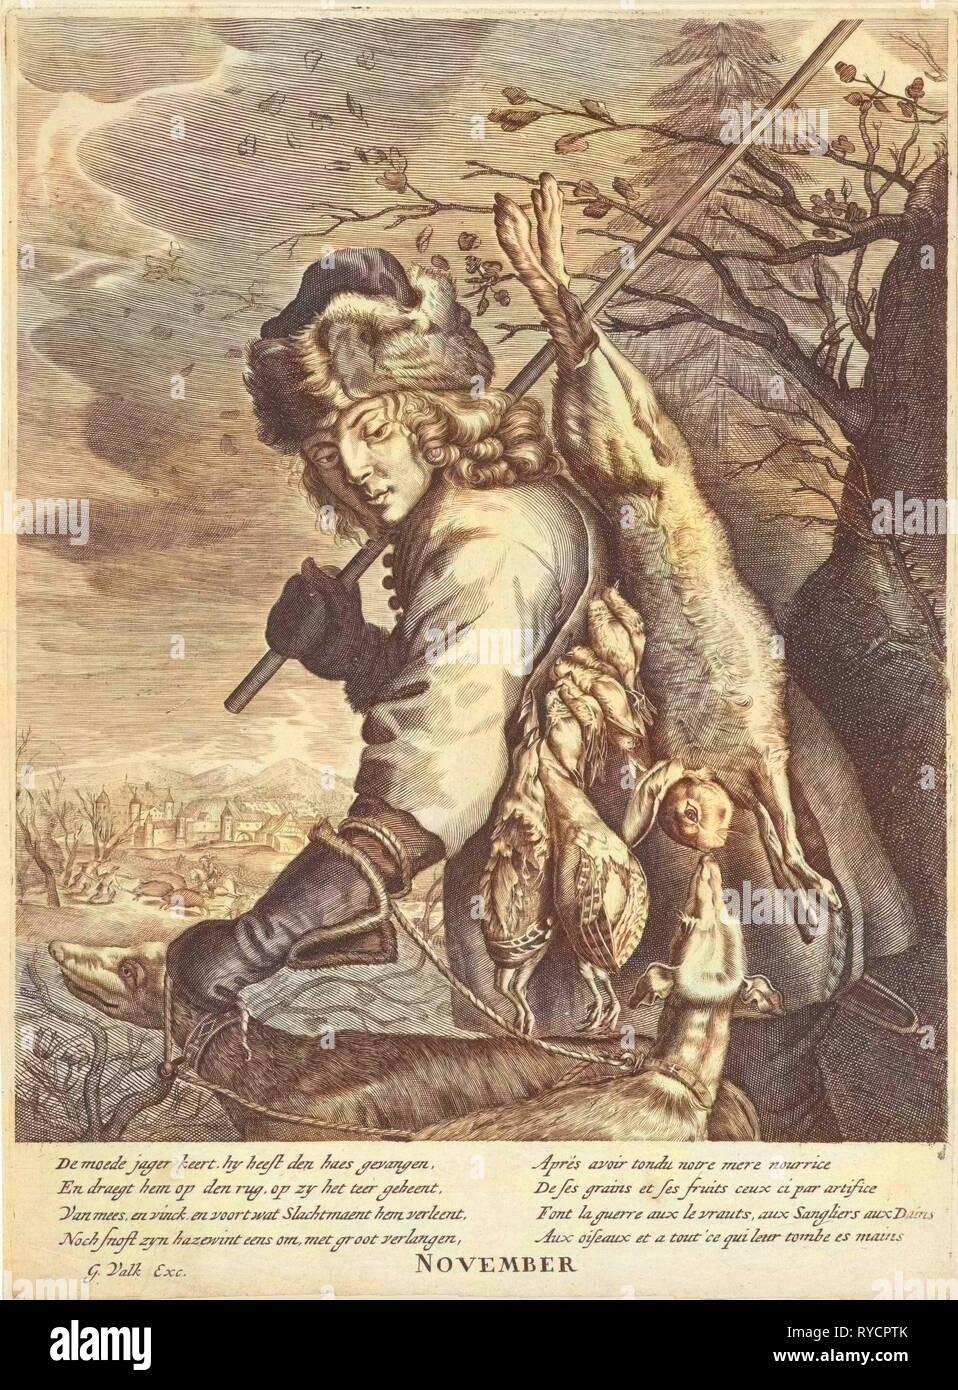 Novembre: Un chasseur avec son butin, anonyme, Reinier van Persijn, Joachim von Sandrart, 1670 - 1726 Photo Stock